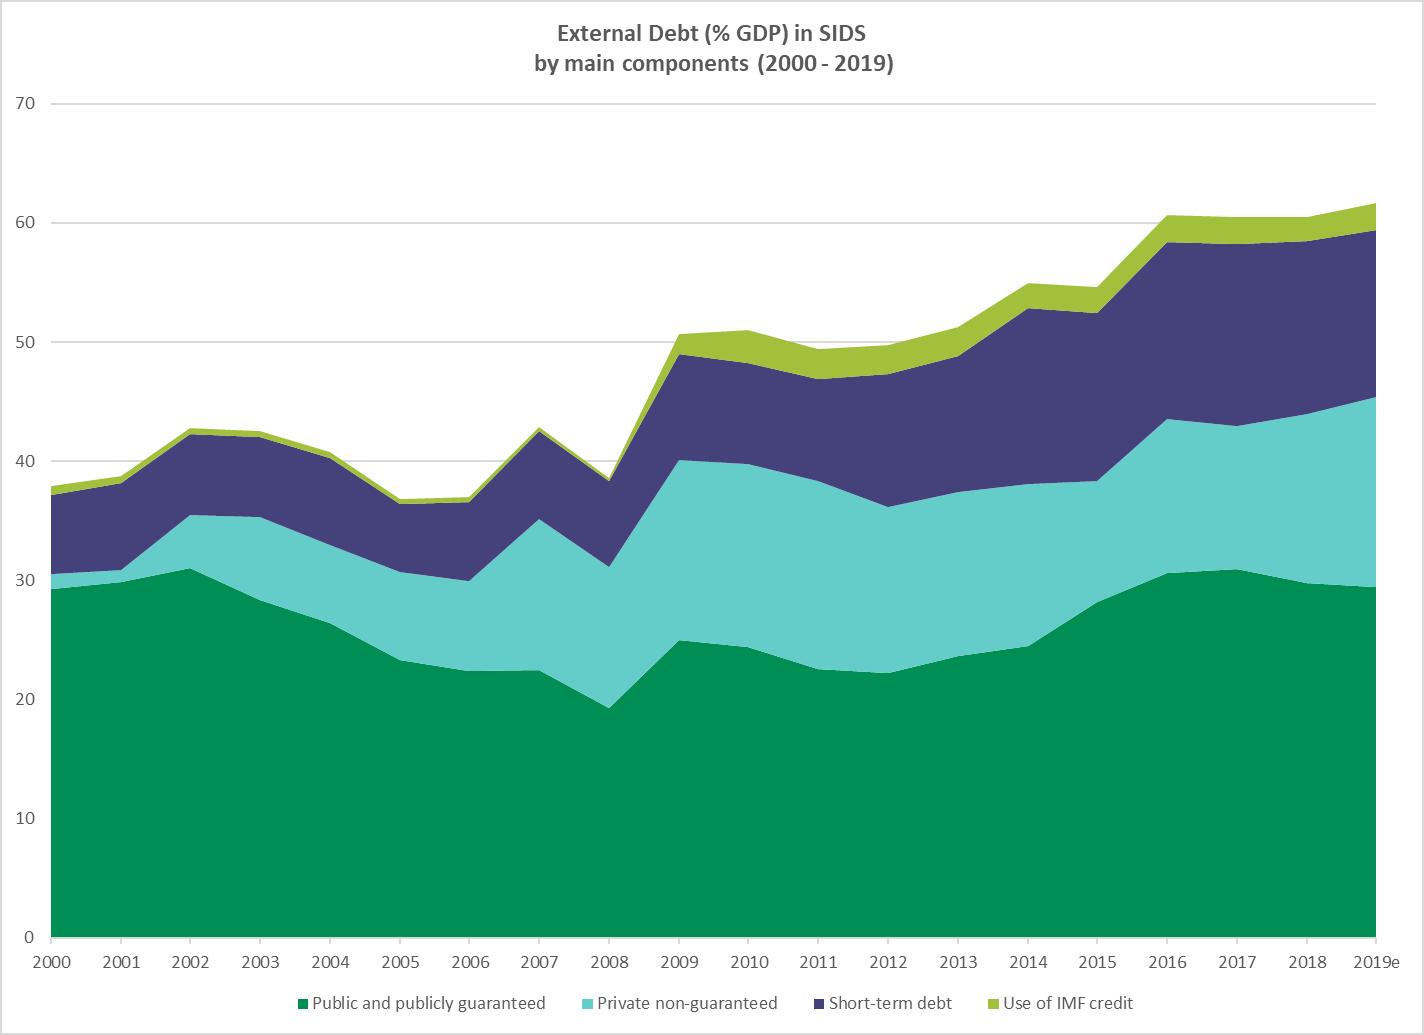 External debt in SIDS